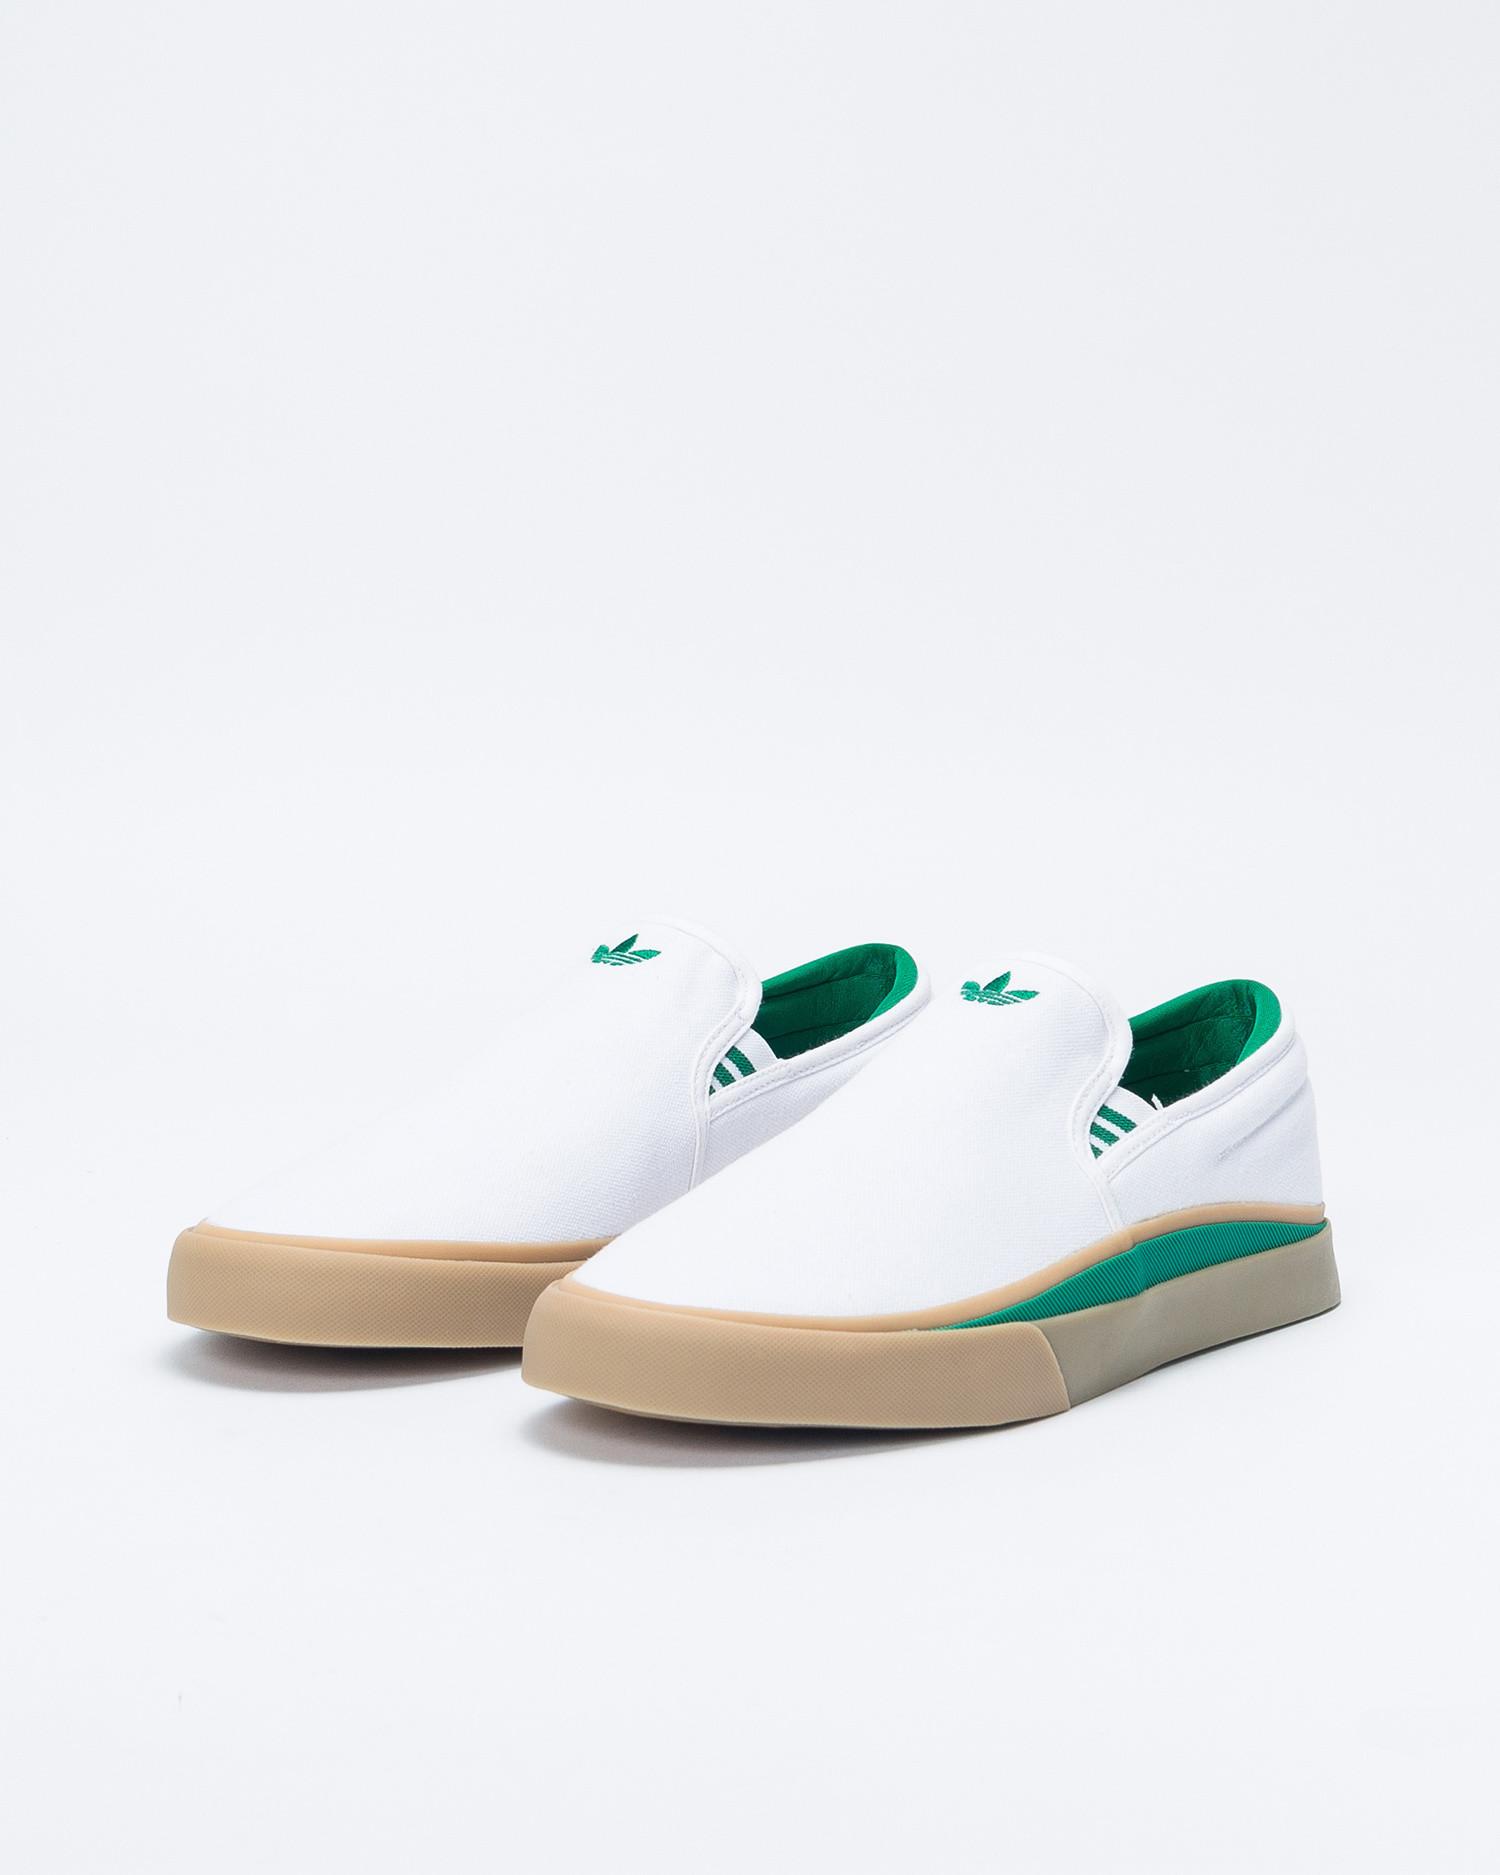 Adidas Sabalo Slip Ftwwht/Bgreen/Gum4